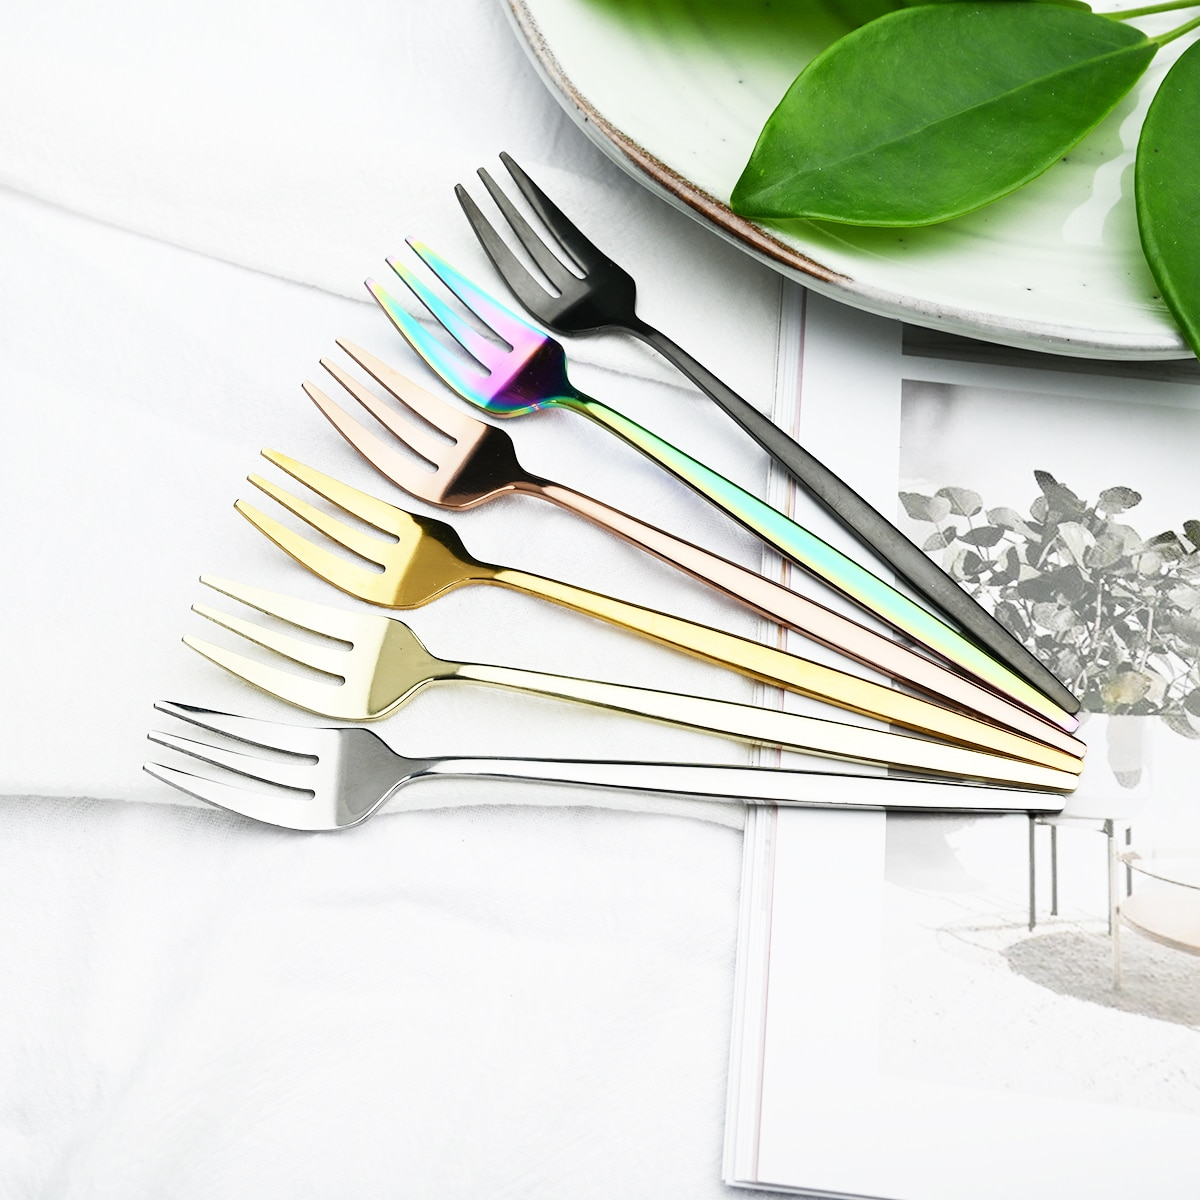 AliExpress - 6Pcs/Set Gold Fork Set Tea Cake Snack Fork Dinnerware Cutlery Mirror Stainless Steel Tableware Dessert Fruit Fork Silverware Set